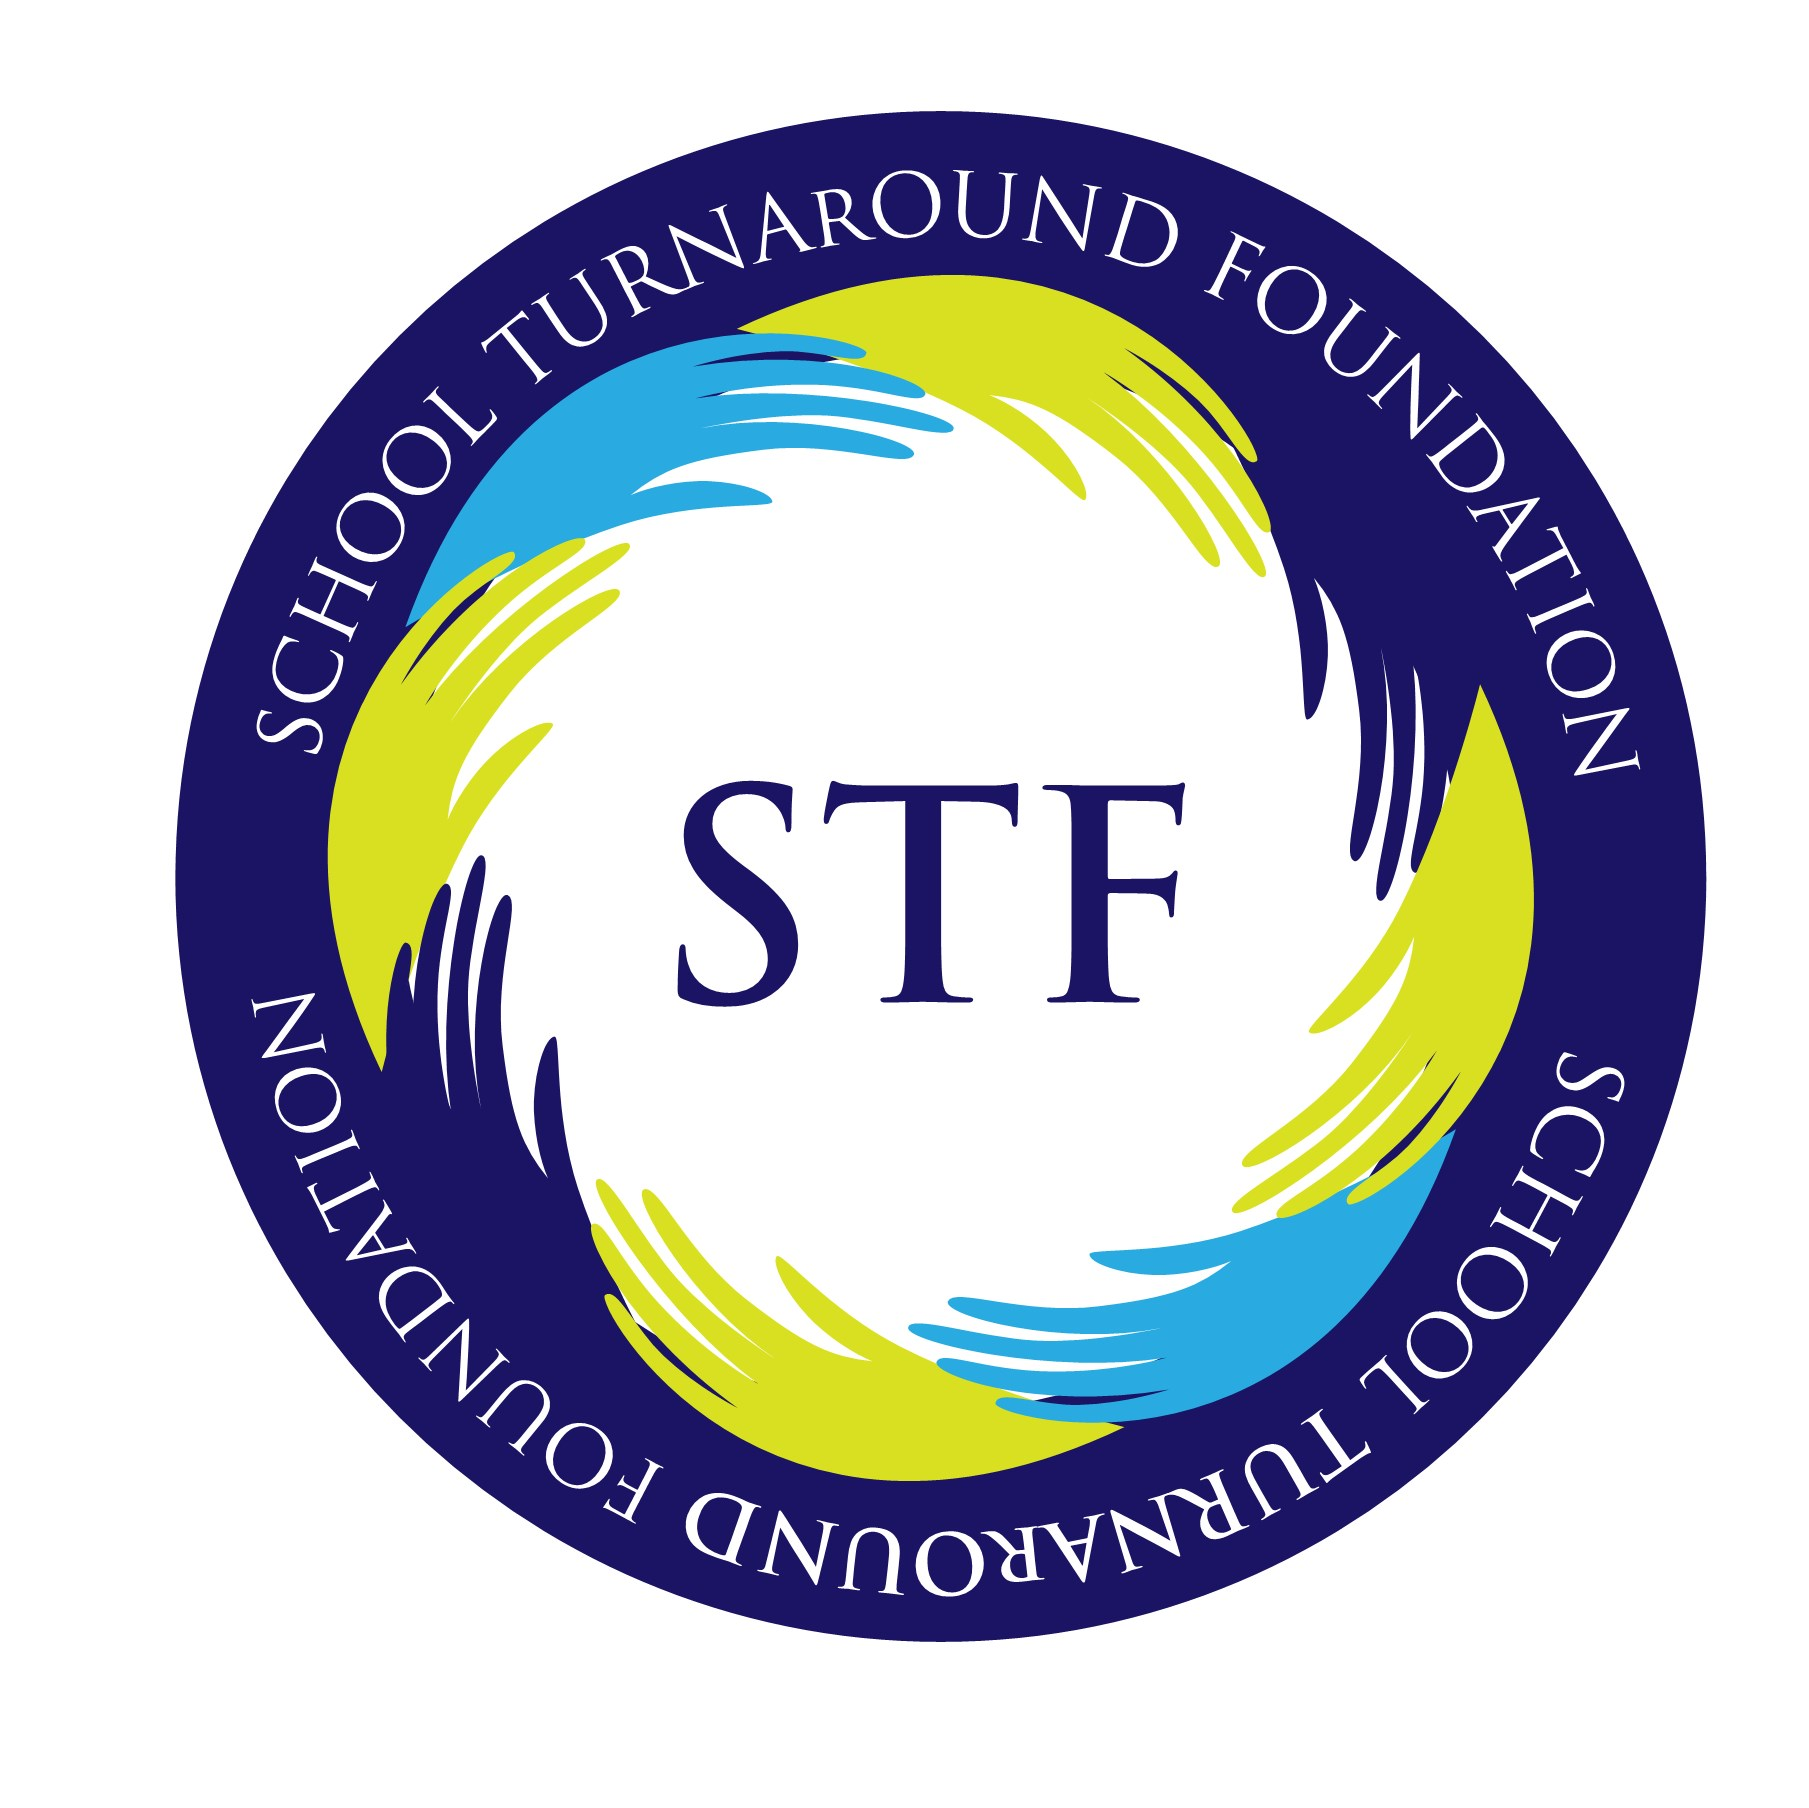 The School Turnaround Foundation